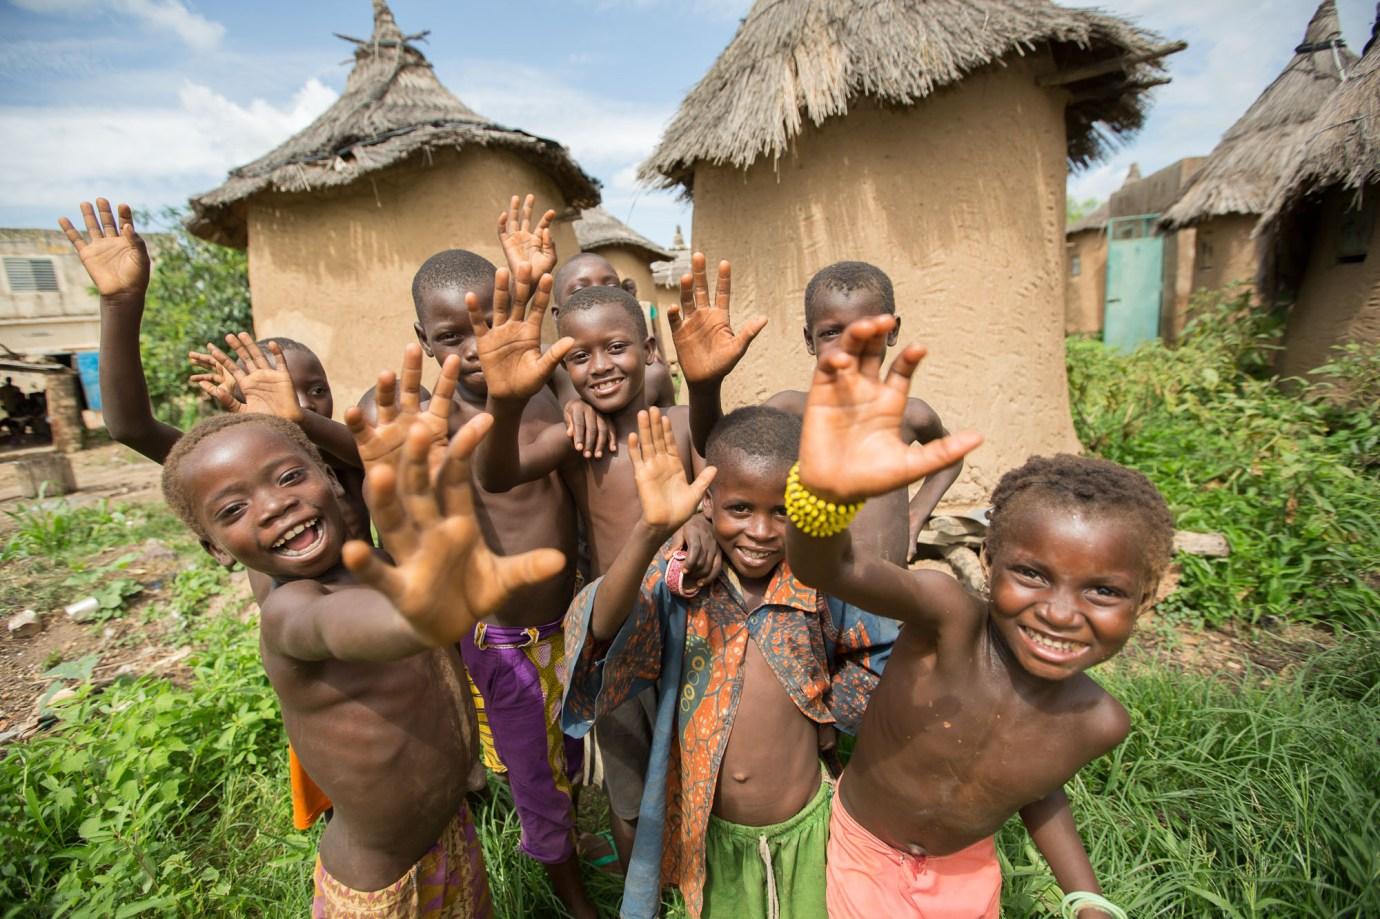 Children huddle together Burkina Faso.